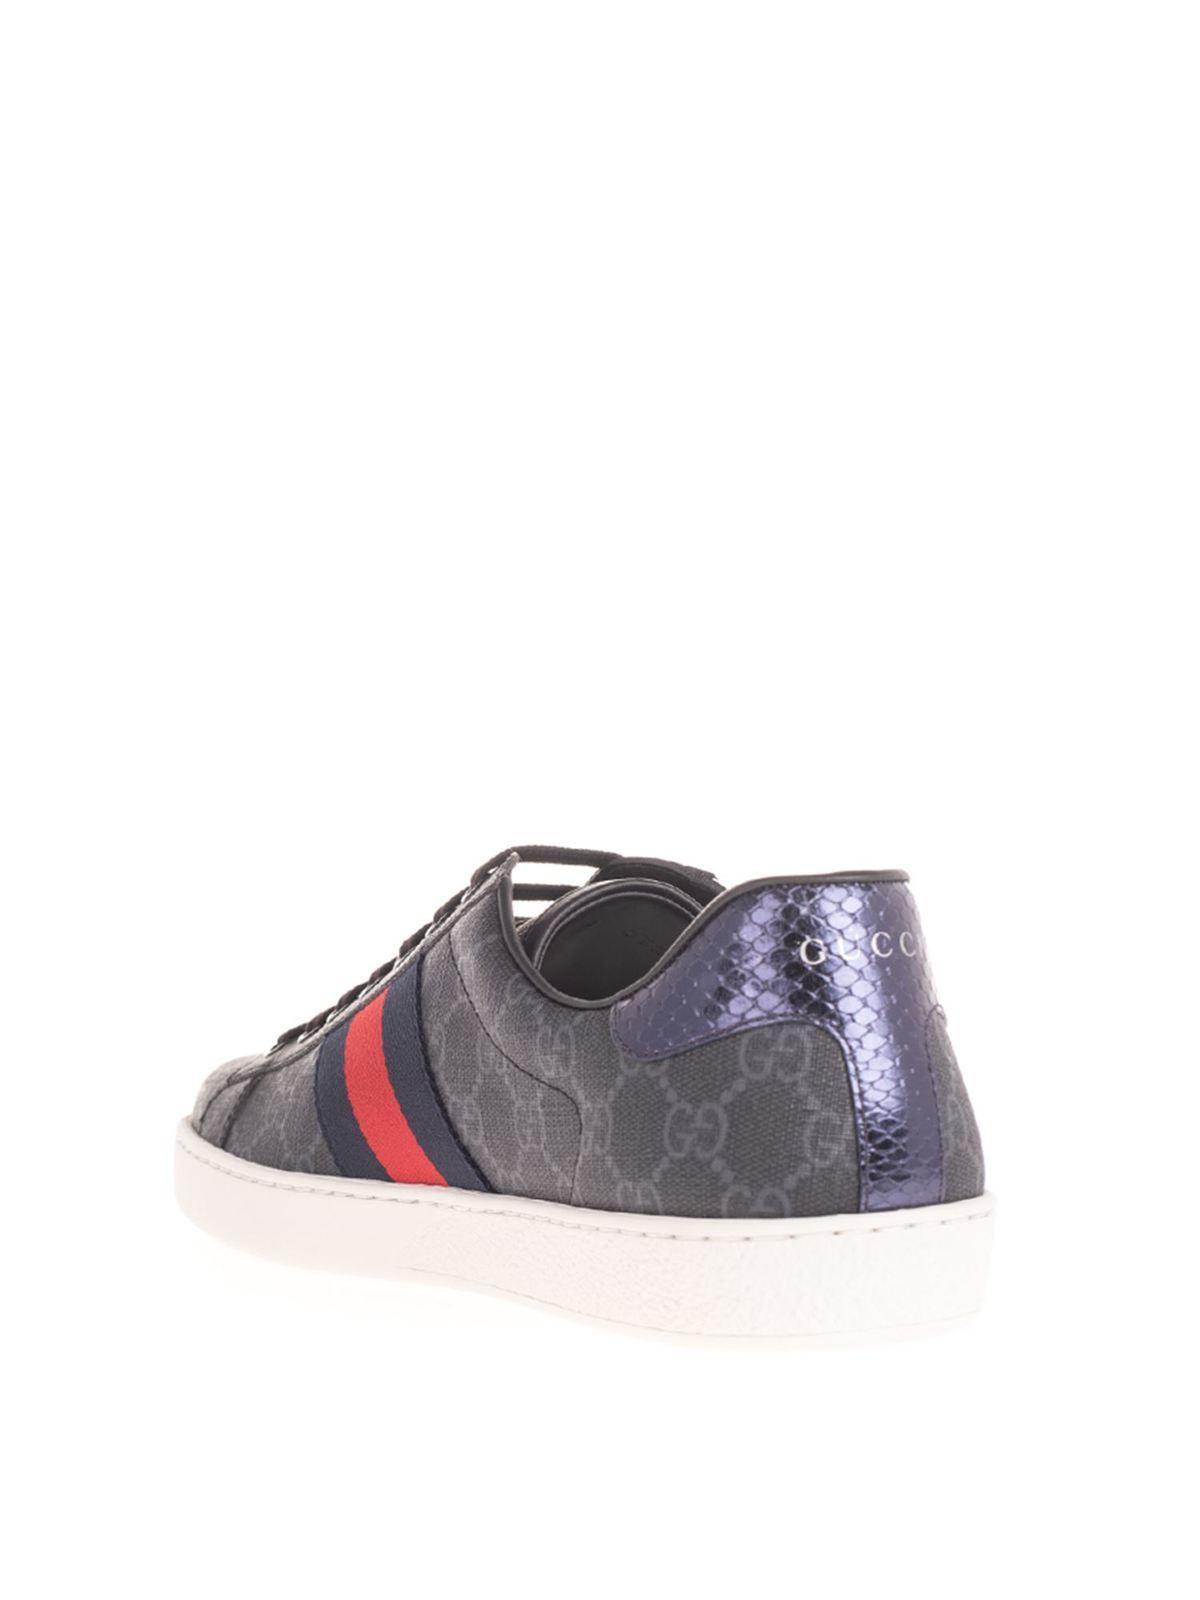 Gucci - Ace GG Supreme sneakers in